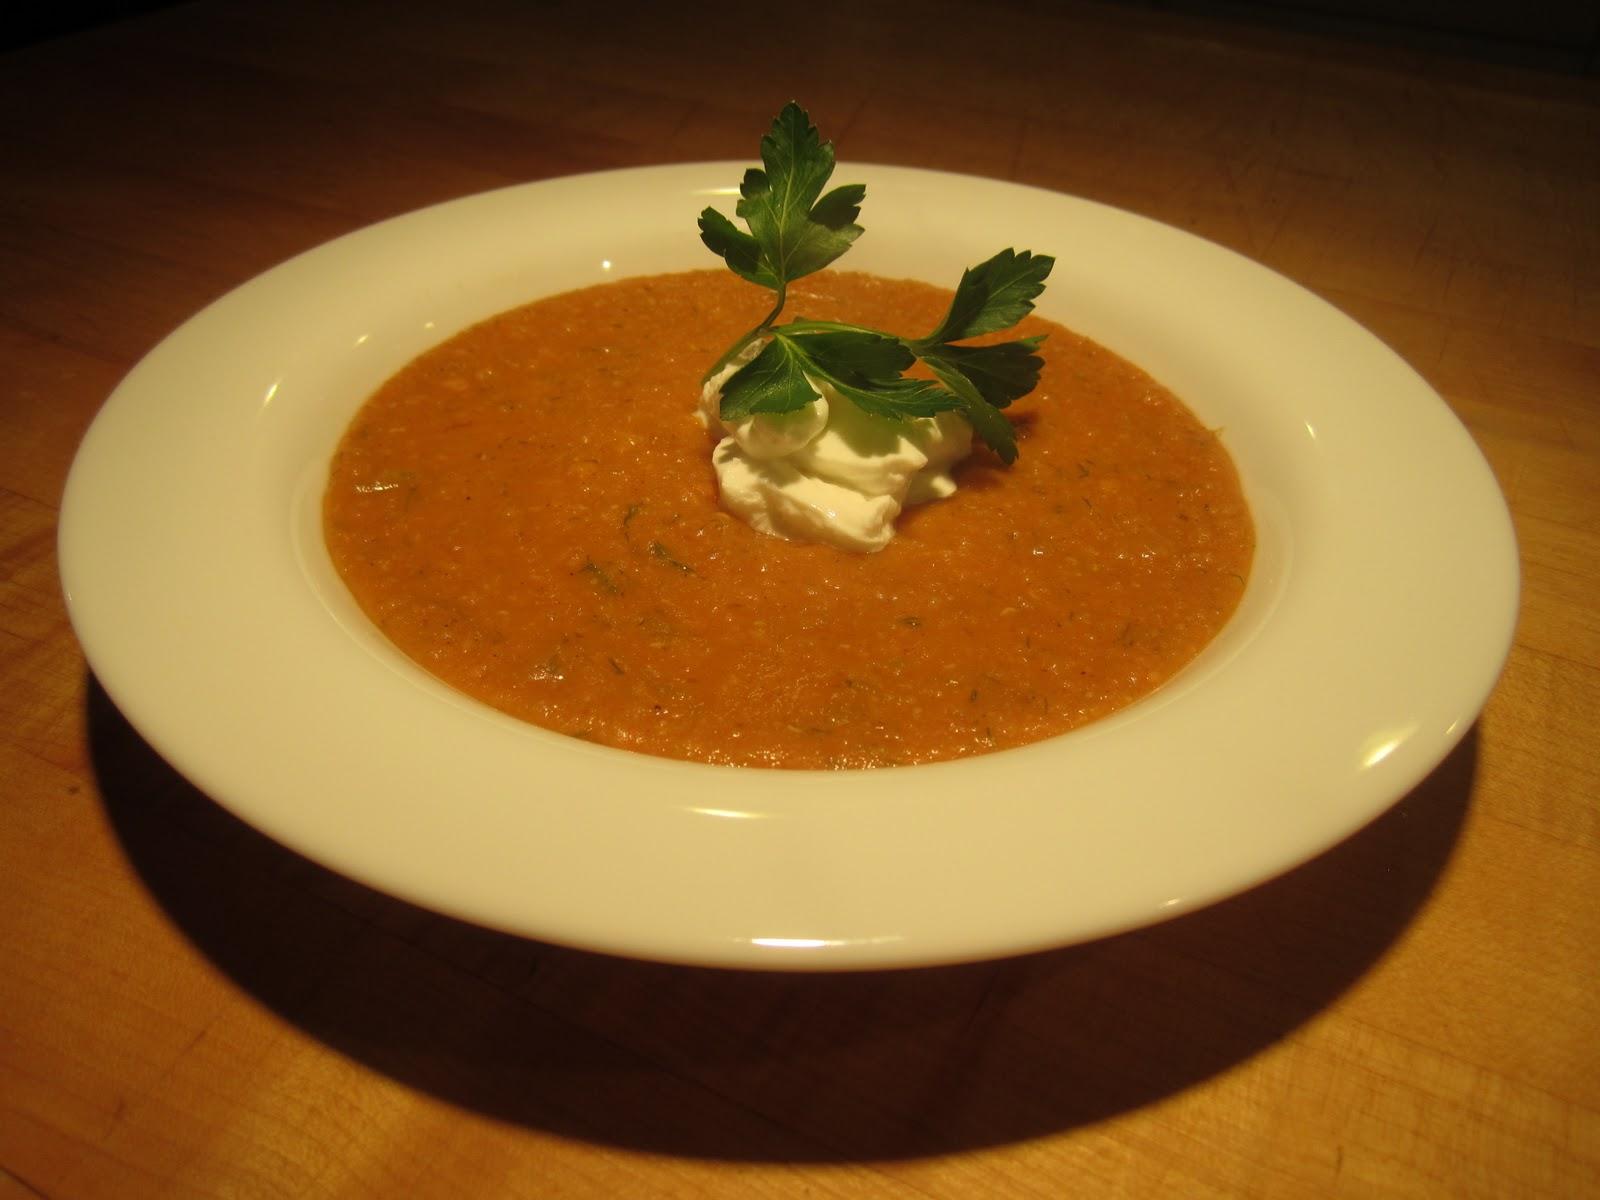 ... lentil soup i think of my family s favorite lemony lentil soup with